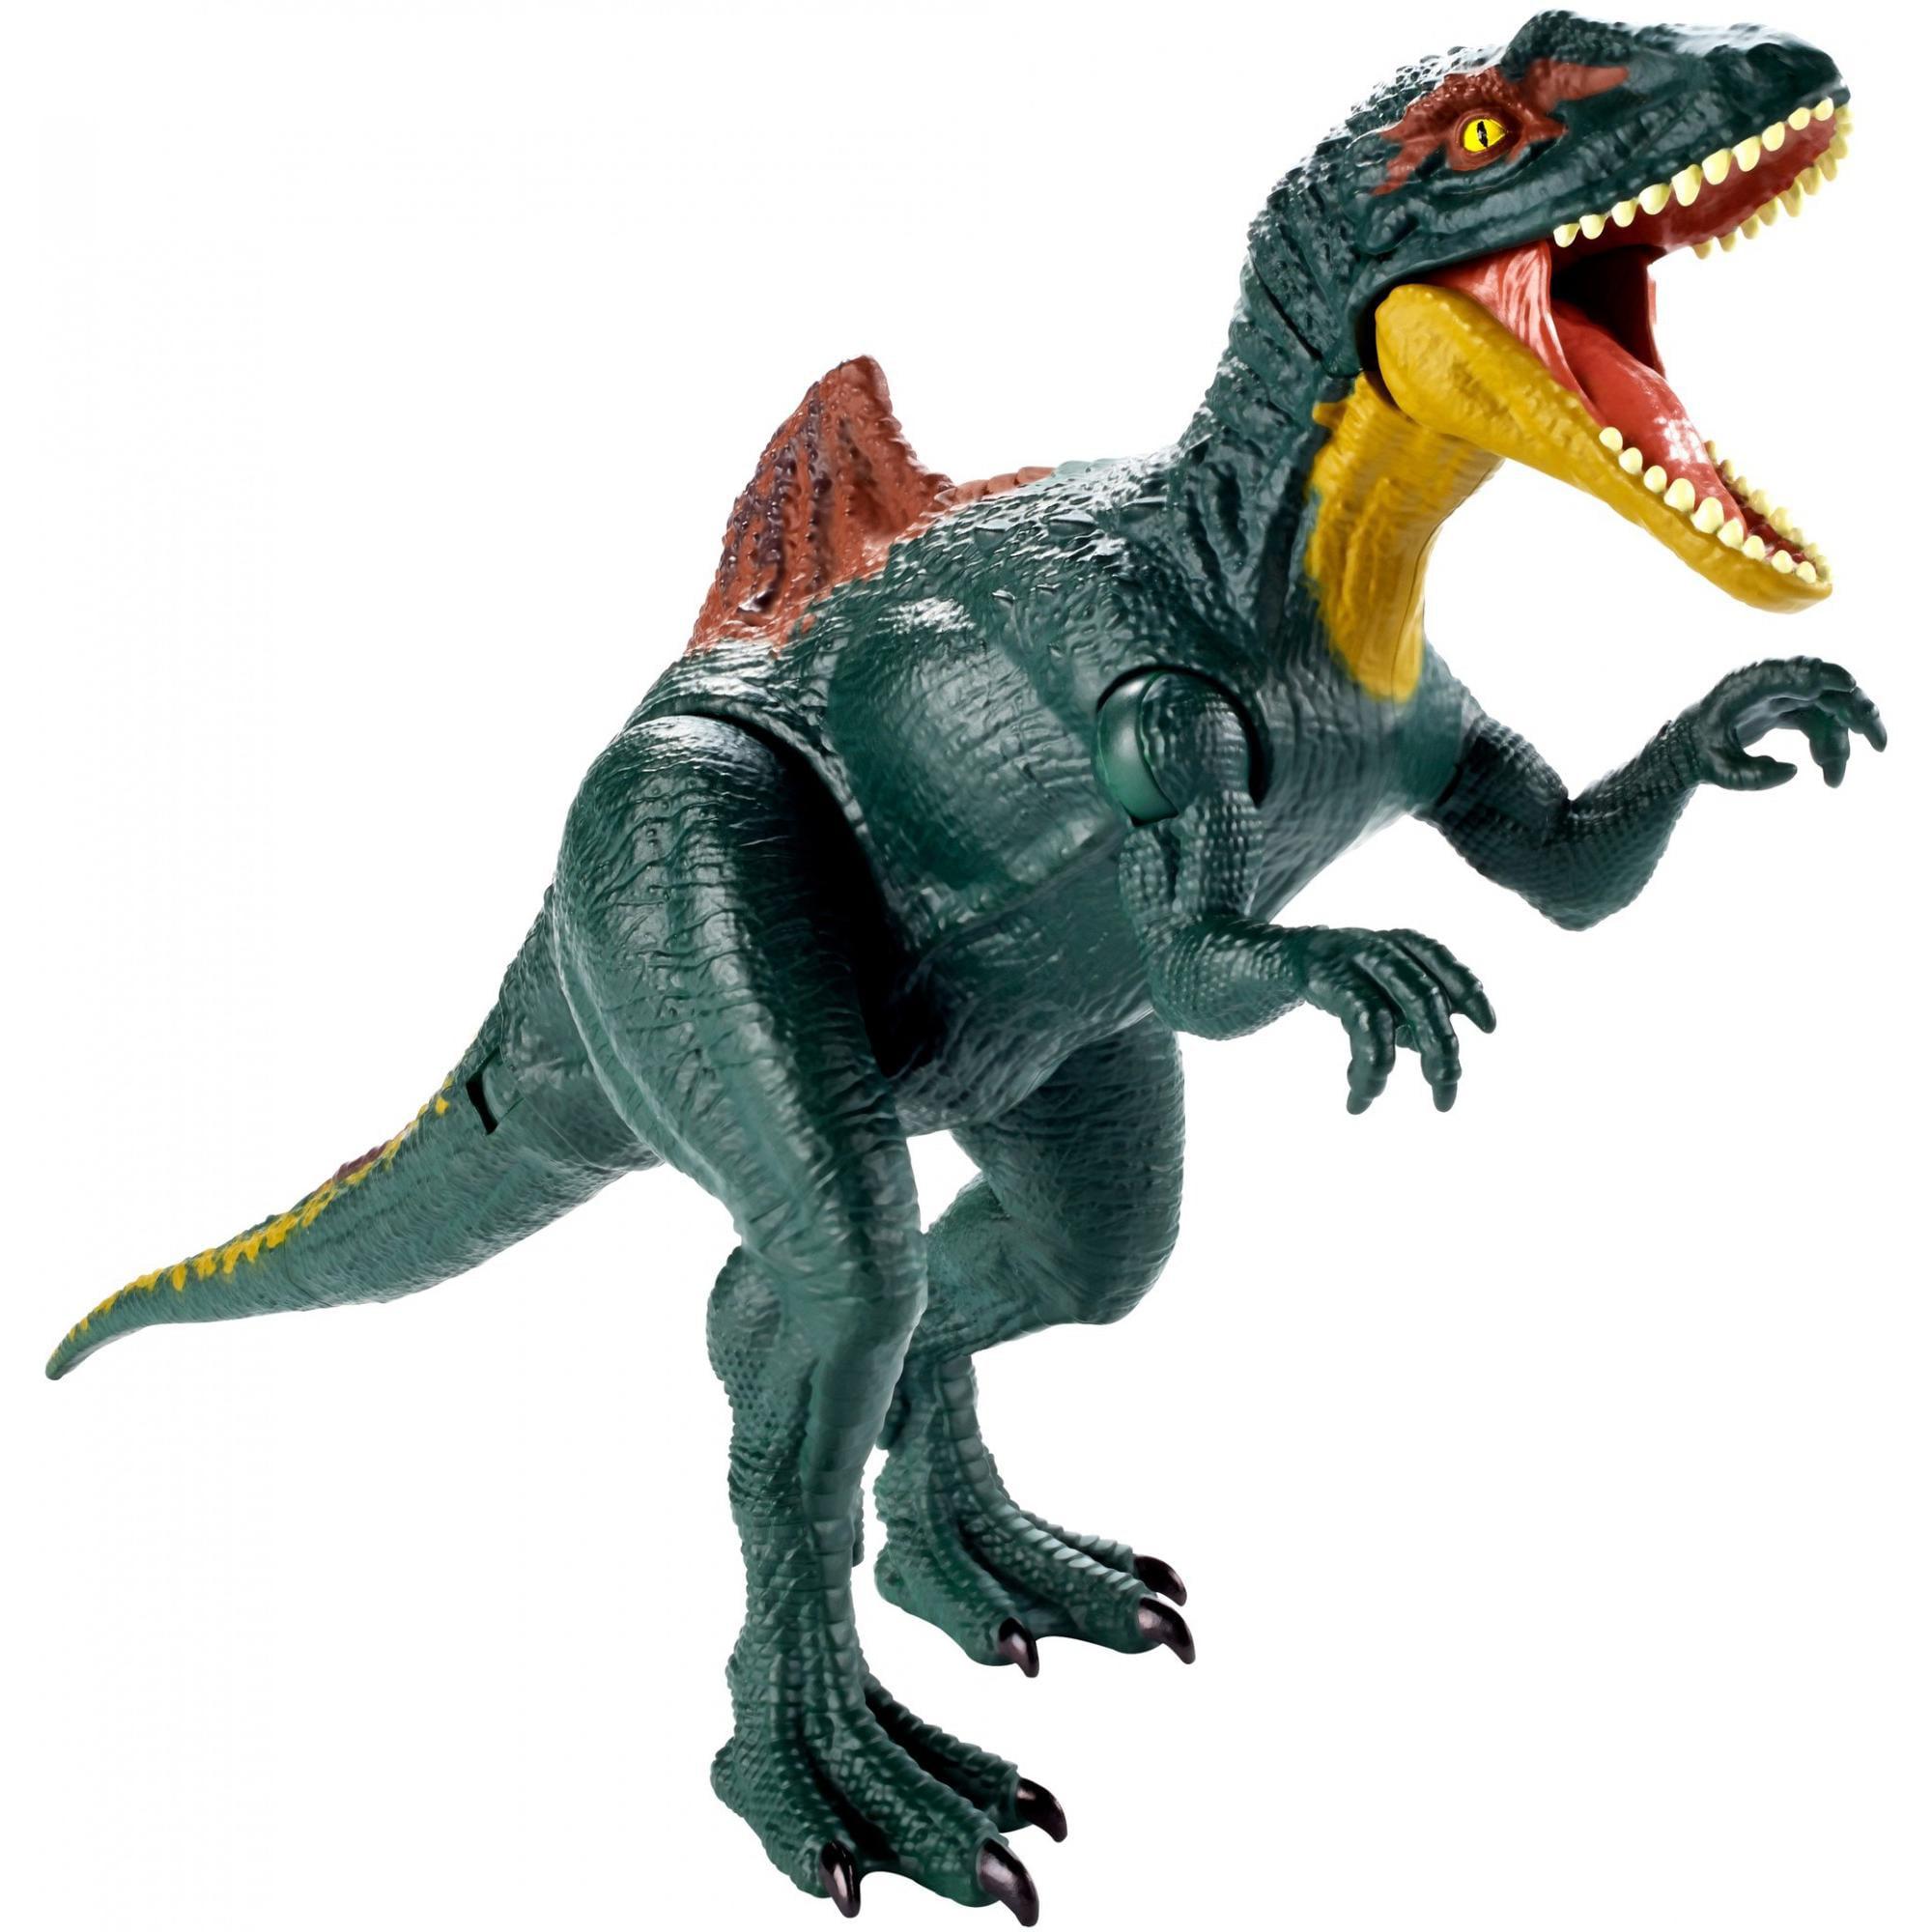 Jurassic World Dino Rivals Dual Attack Concavenator Dinosaur